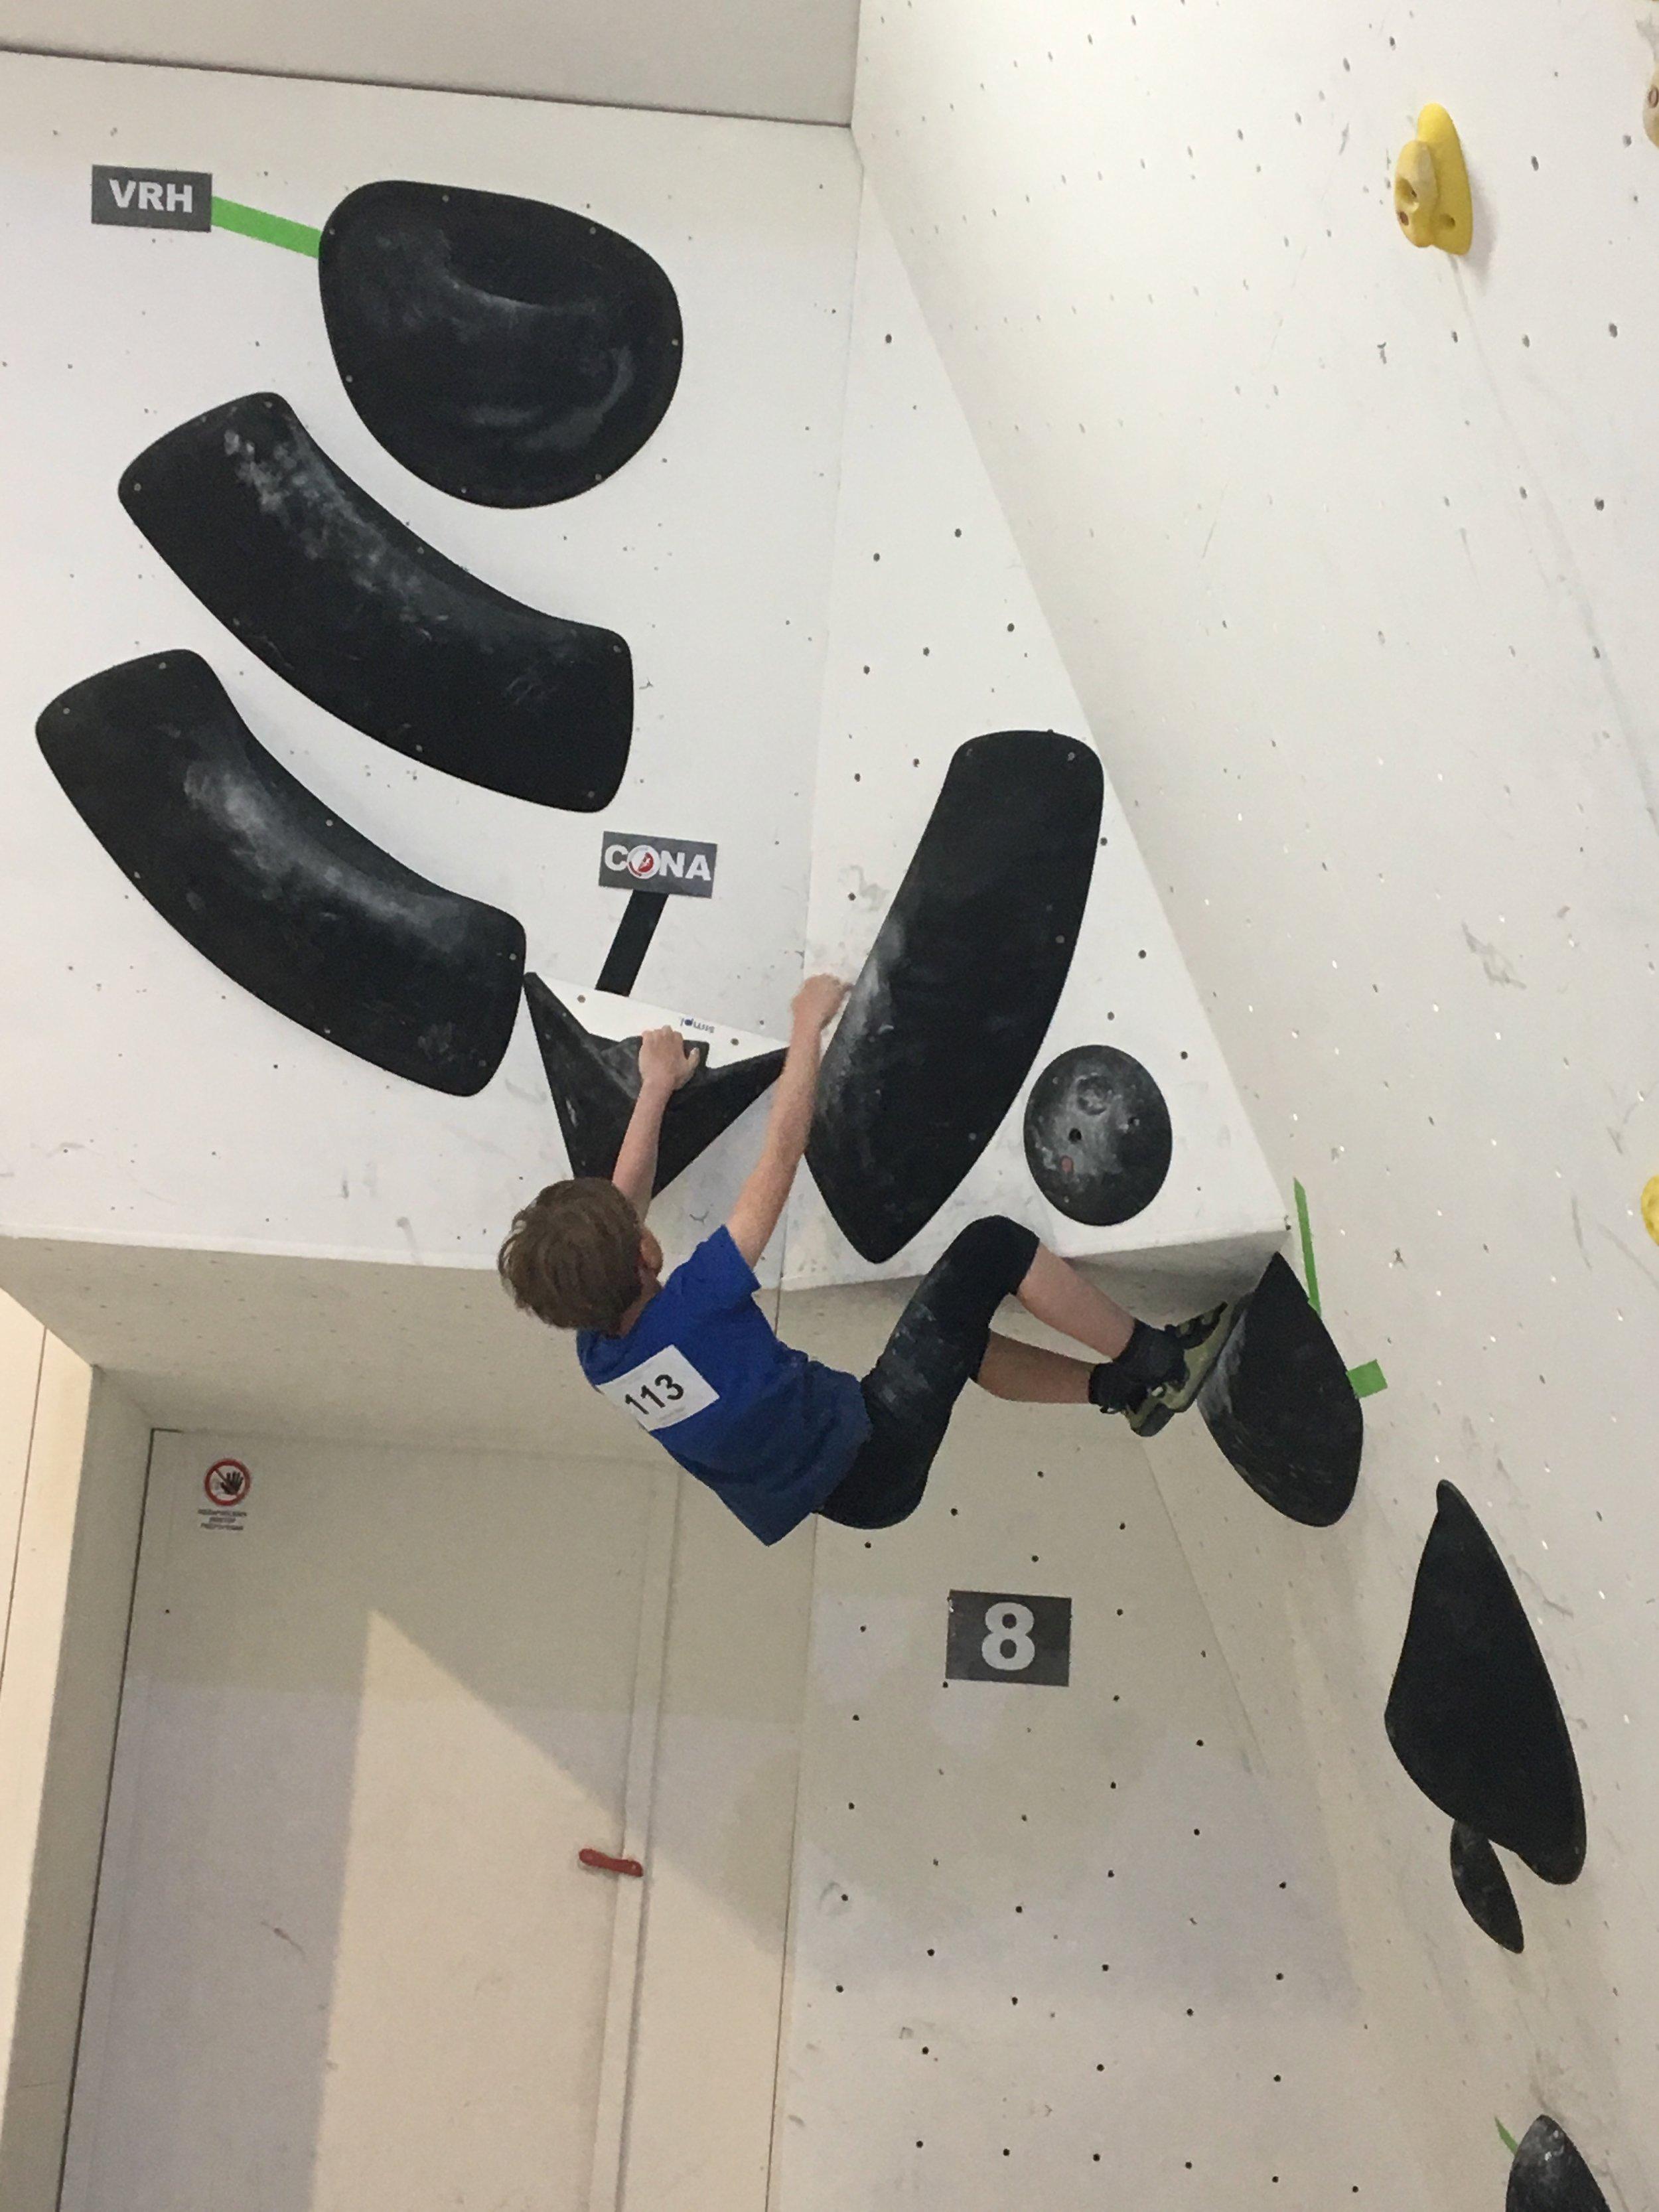 Plezalni tekma Grif Kamnik 2019_192.jpg